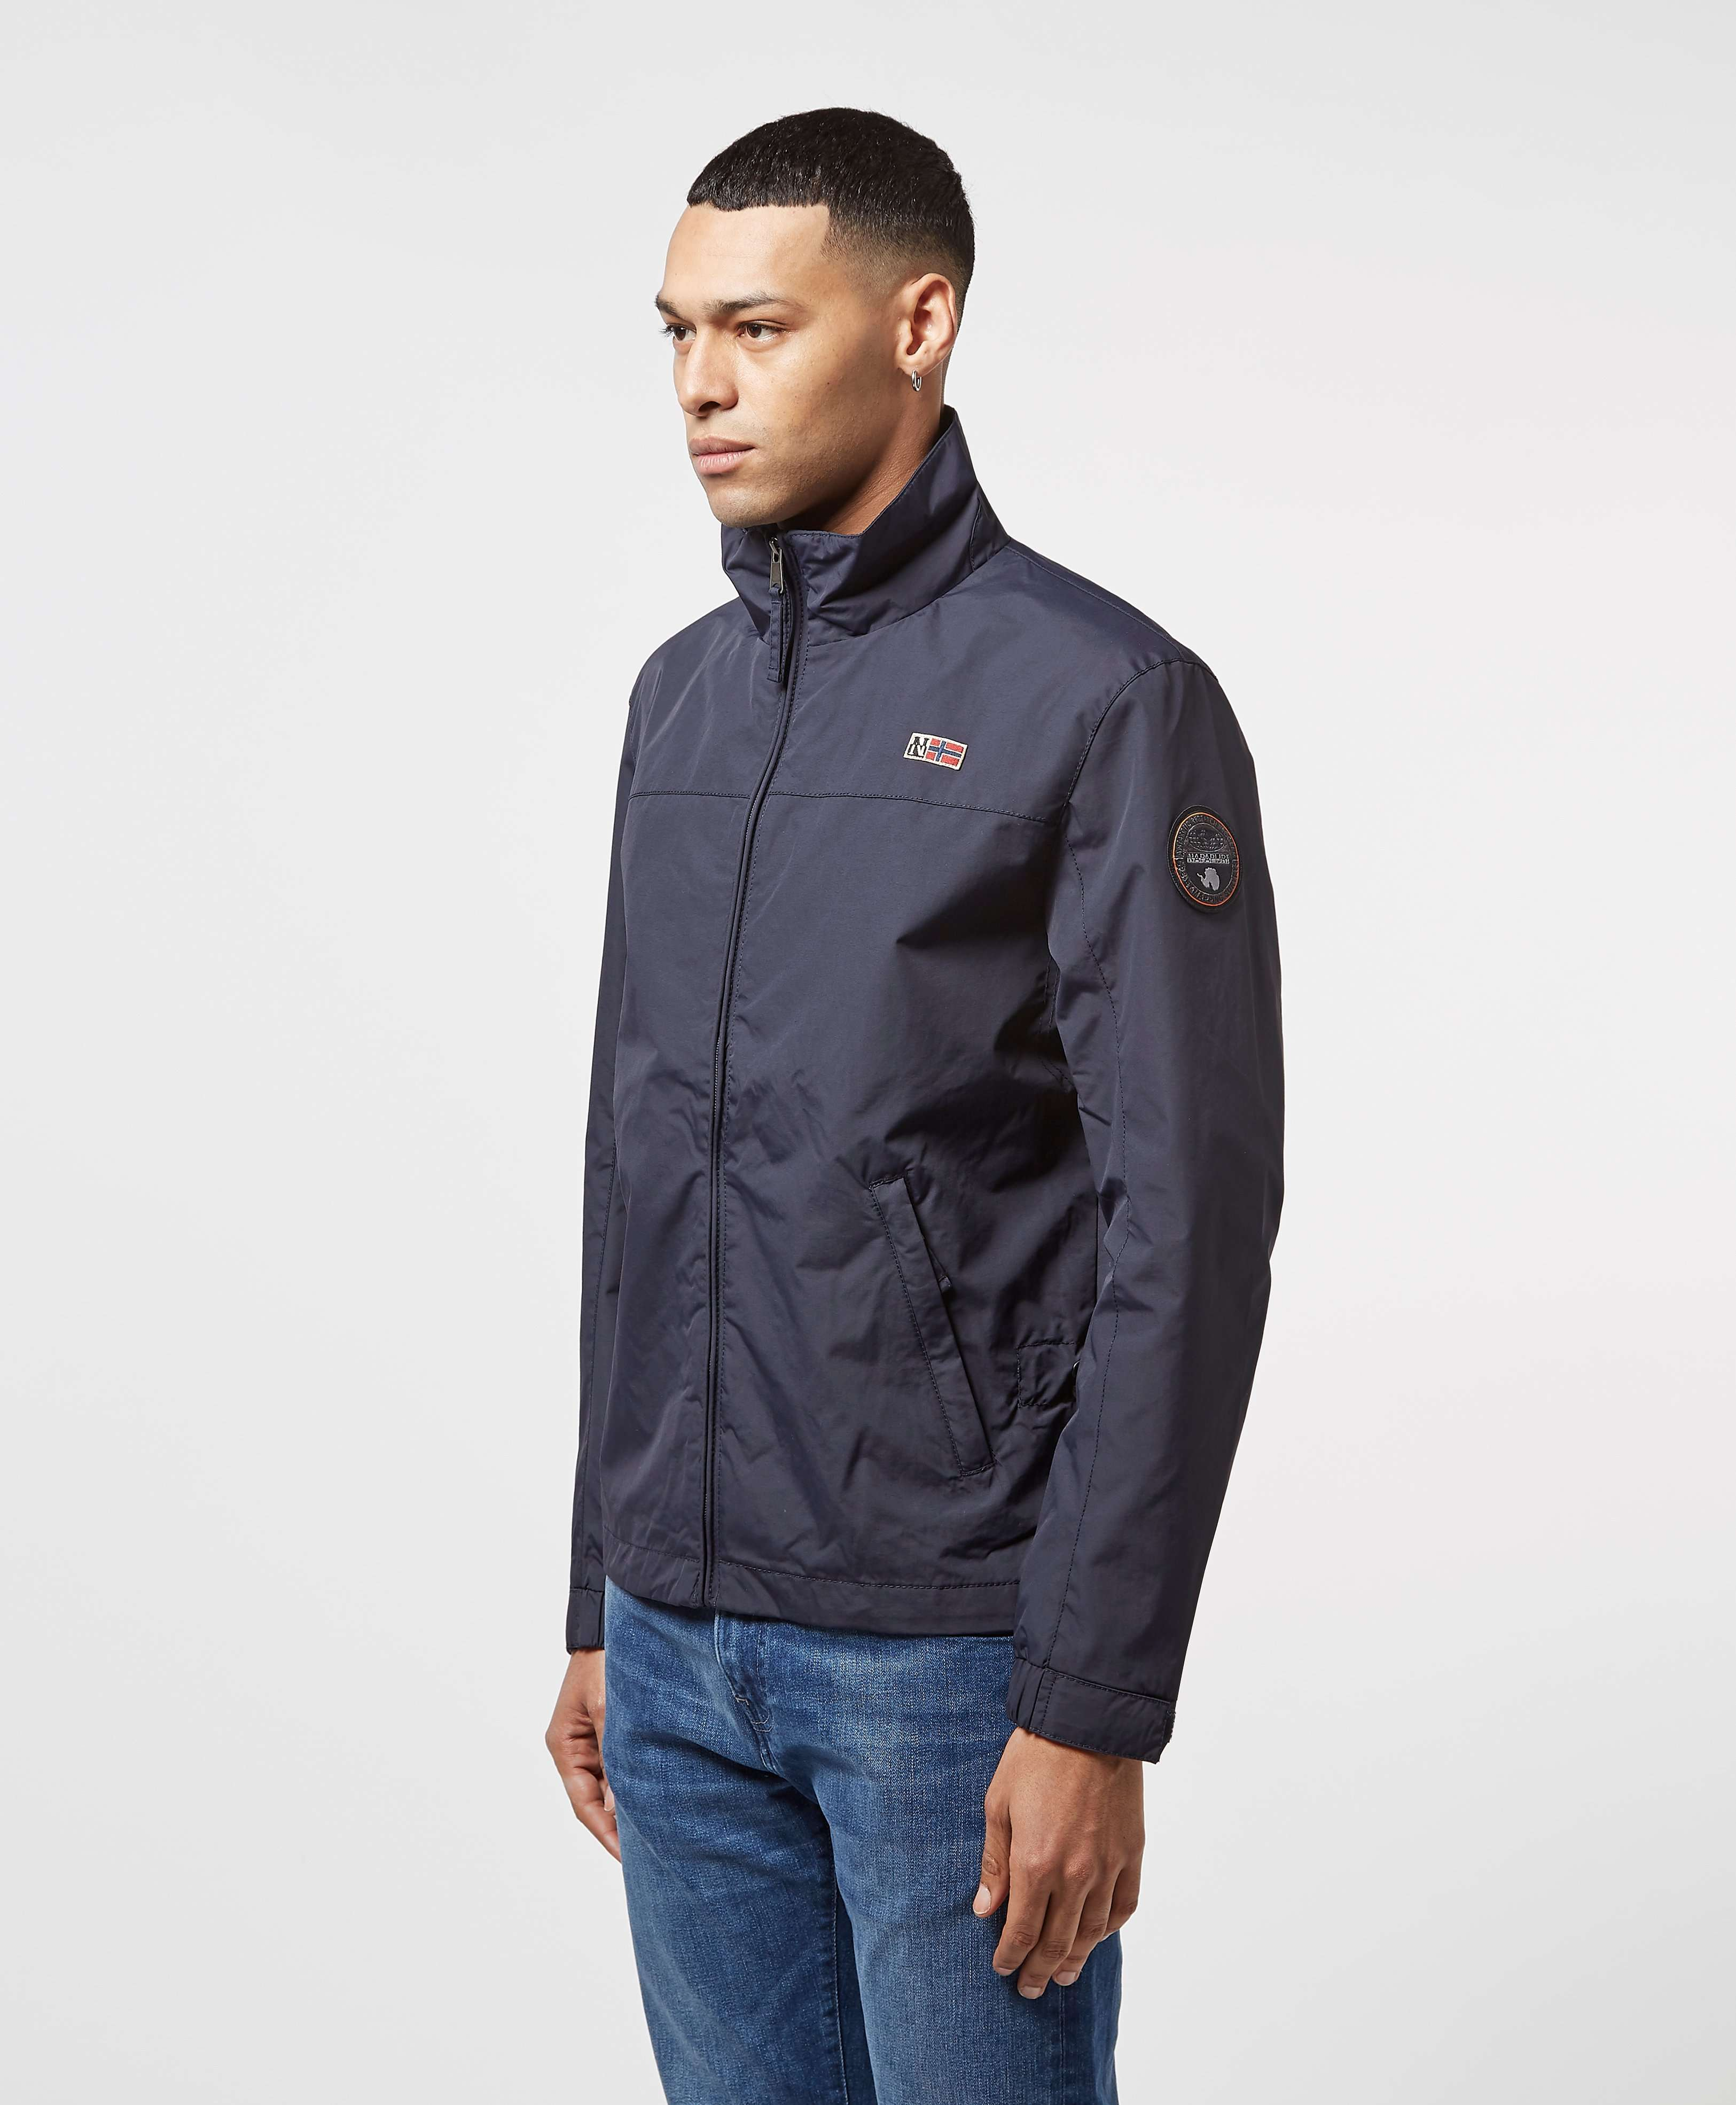 Napapijri Shelter Lightweight Jacket